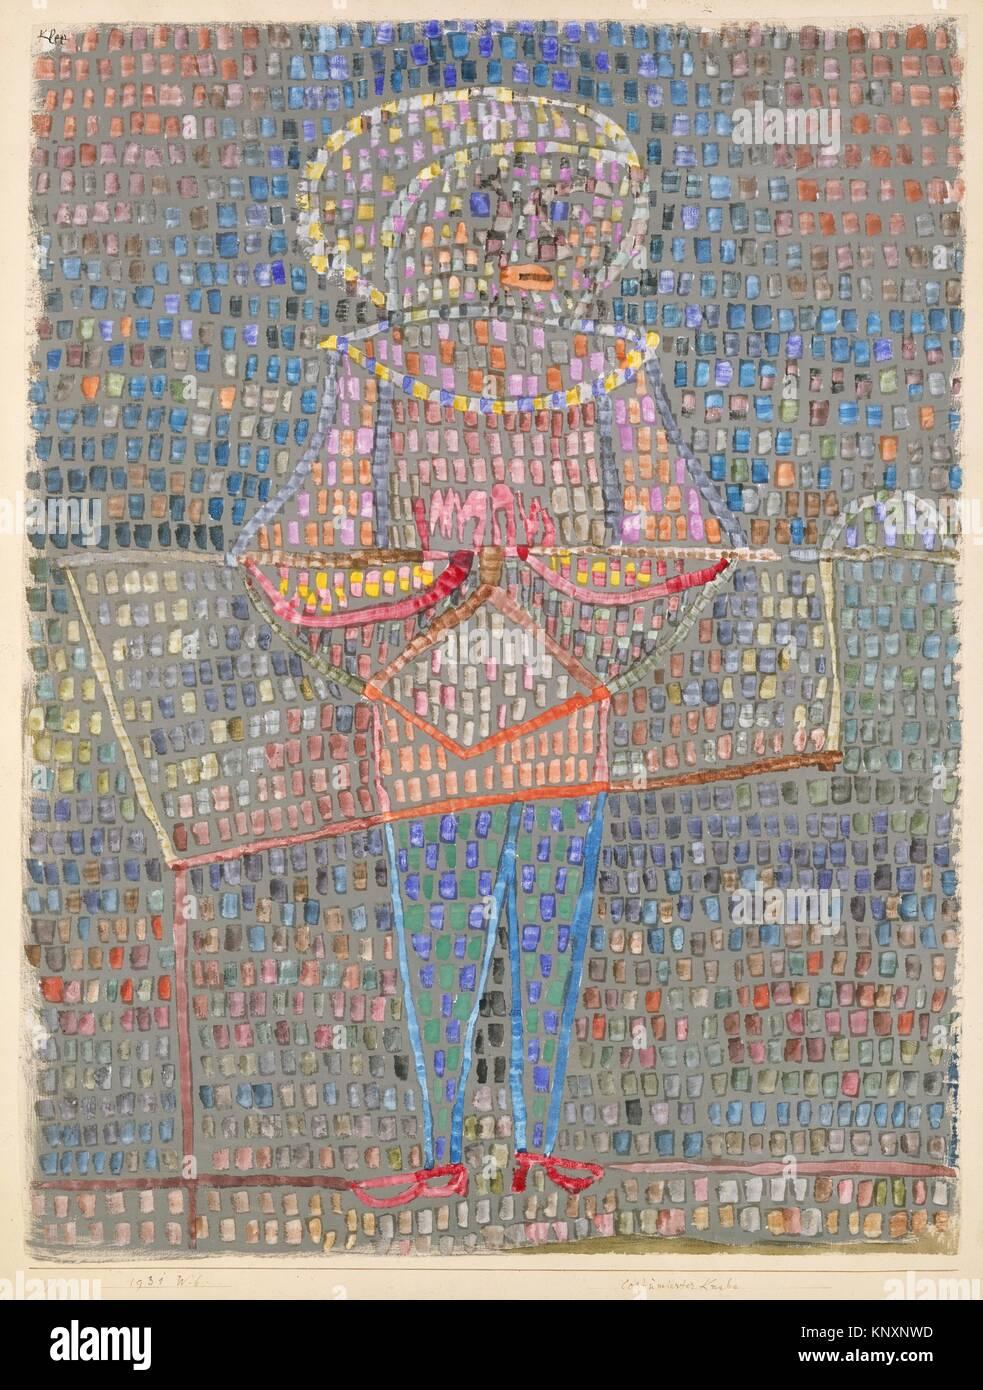 Boy in Fancy Dress. Artist: Paul Klee (German (born Switzerland), Münchenbuchsee 1879-1940 Muralto-Locarno); - Stock Image